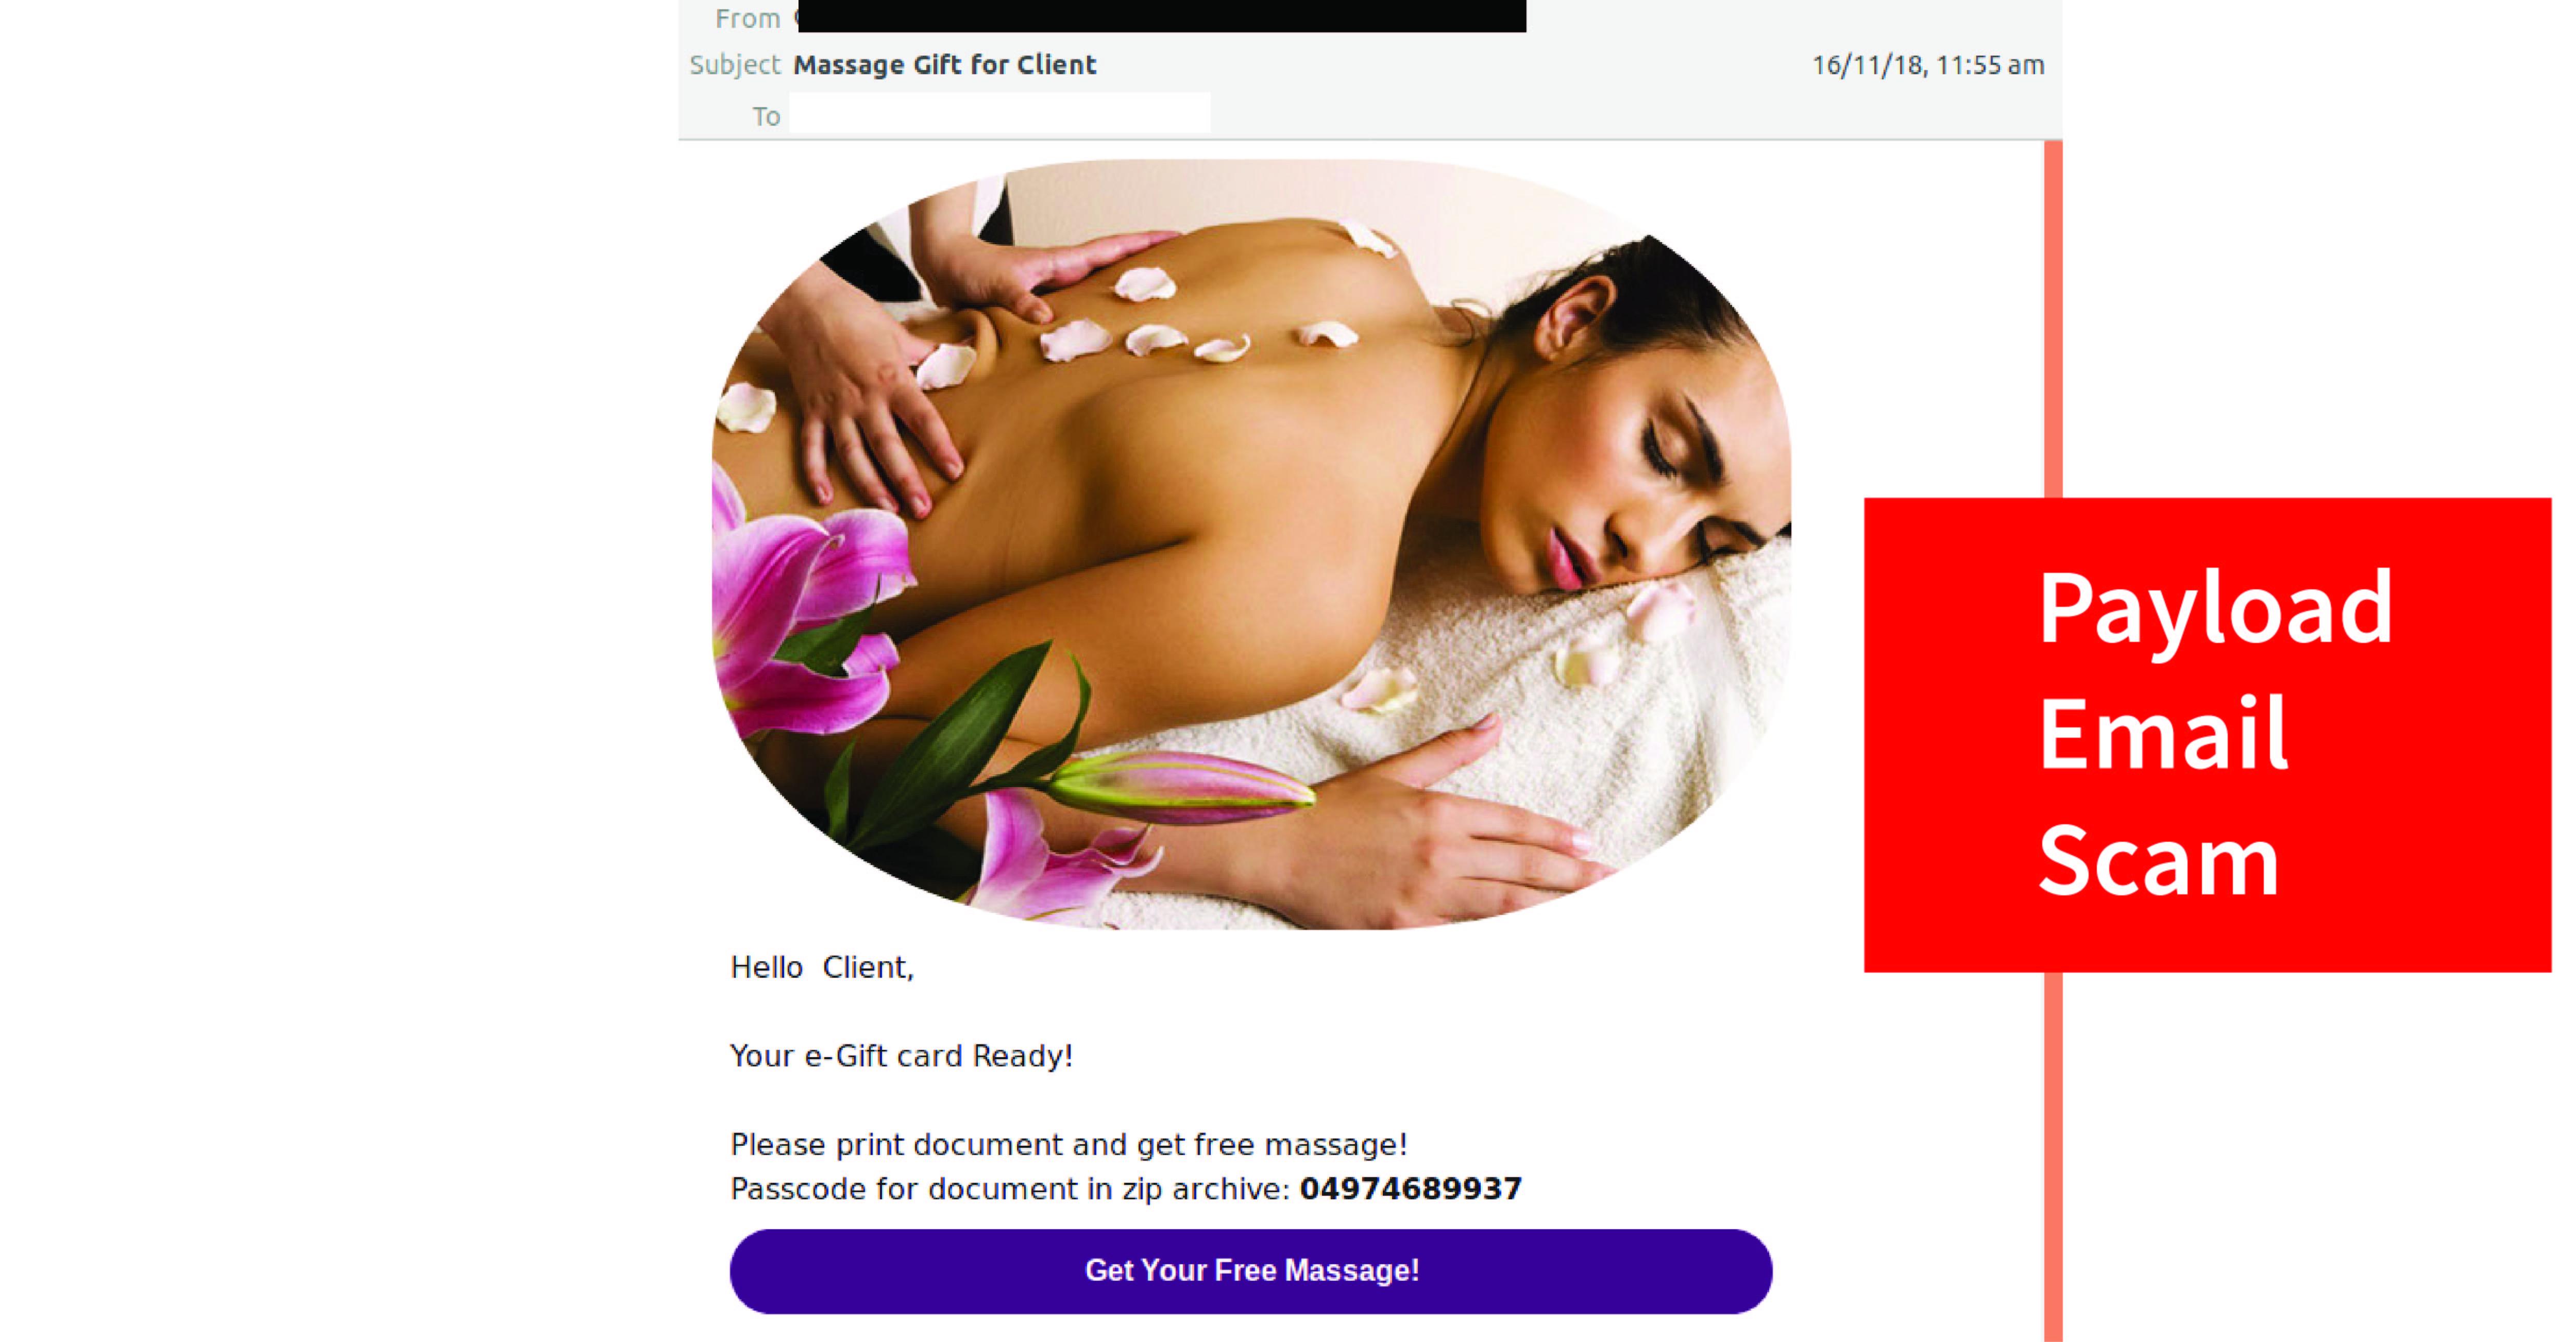 Massage Payload Scam Social Image